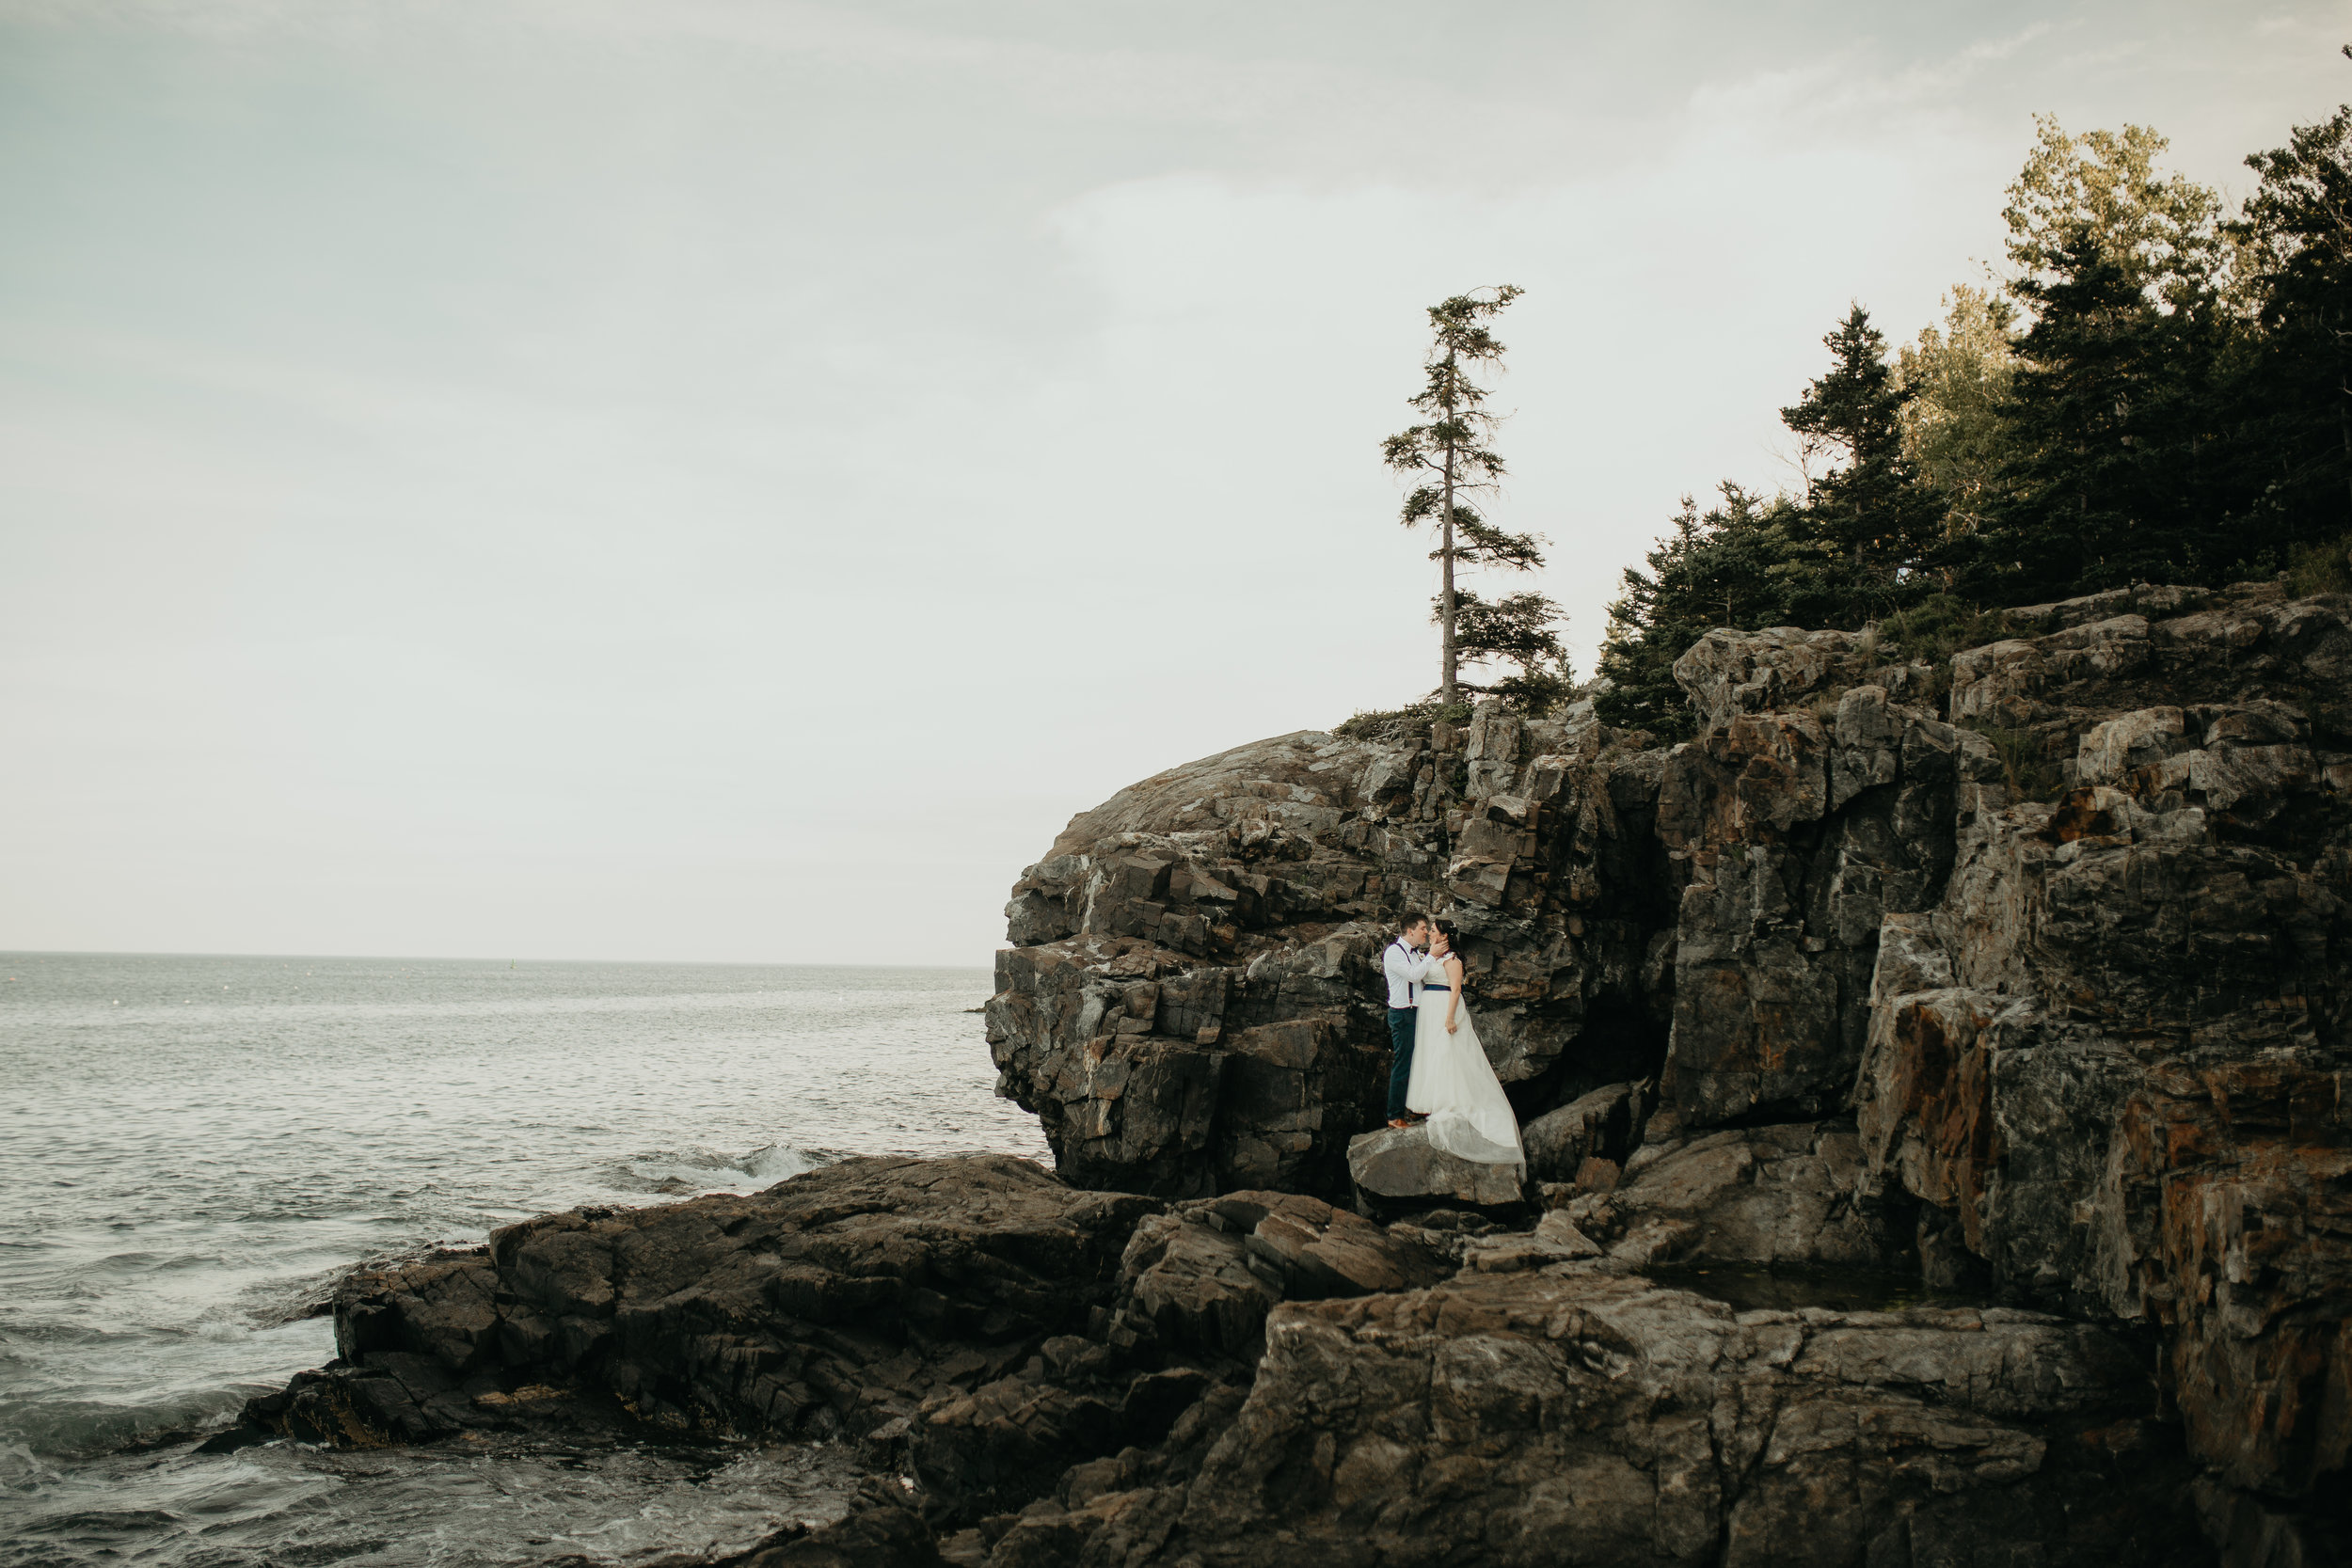 nicole-daacke-photography-Elopement-rocky-shoreline-coast-Acadia-National-Park-elopement-photographer-inspiration-maine-elopement-otter-cliffs-schoonic-head-point-38.jpg